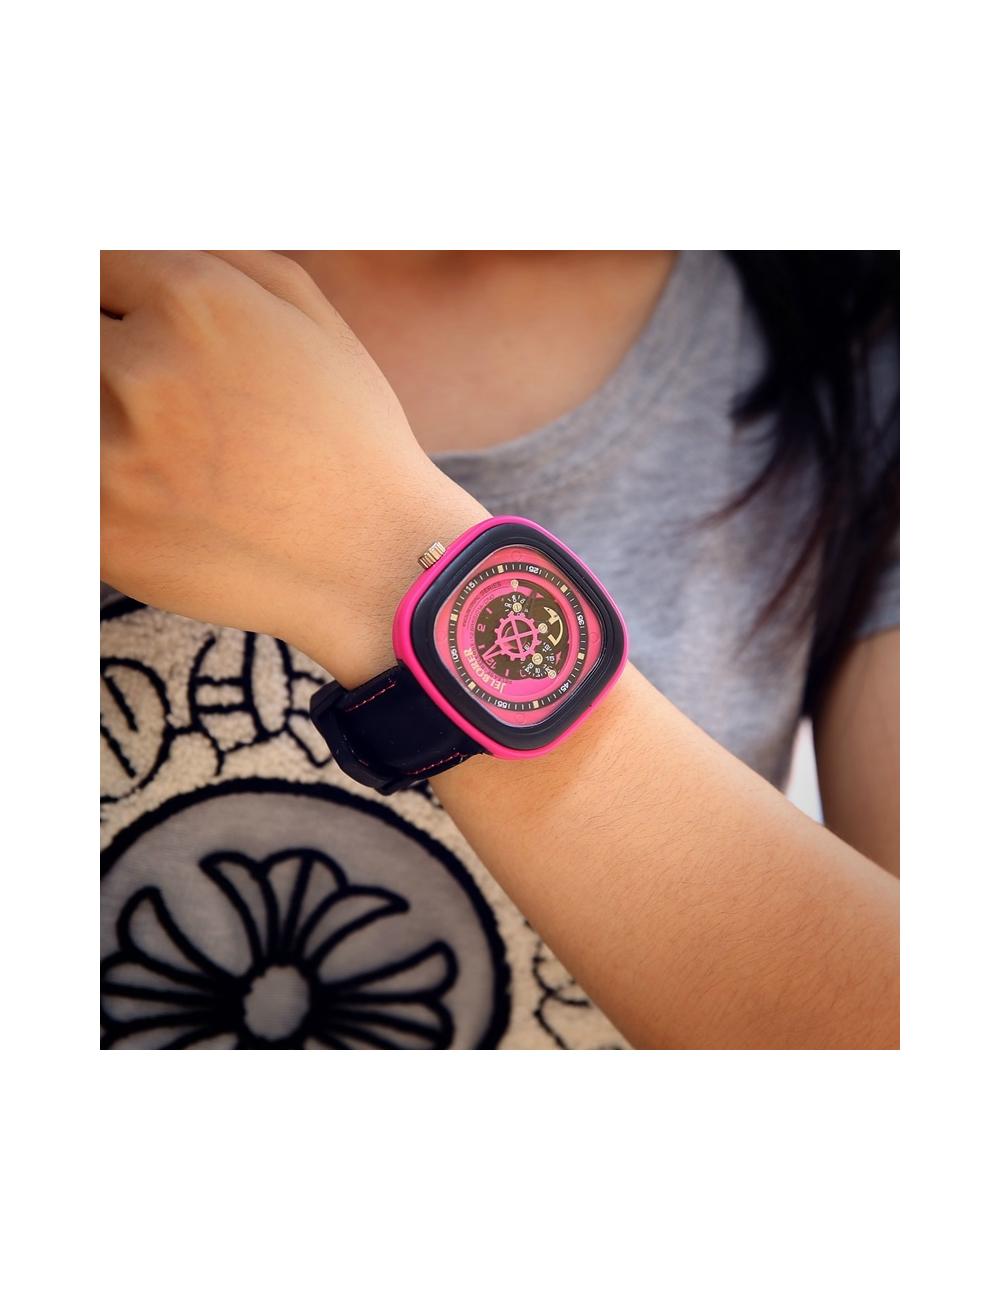 Reloj Rectangular Dayoshop 49,900.00